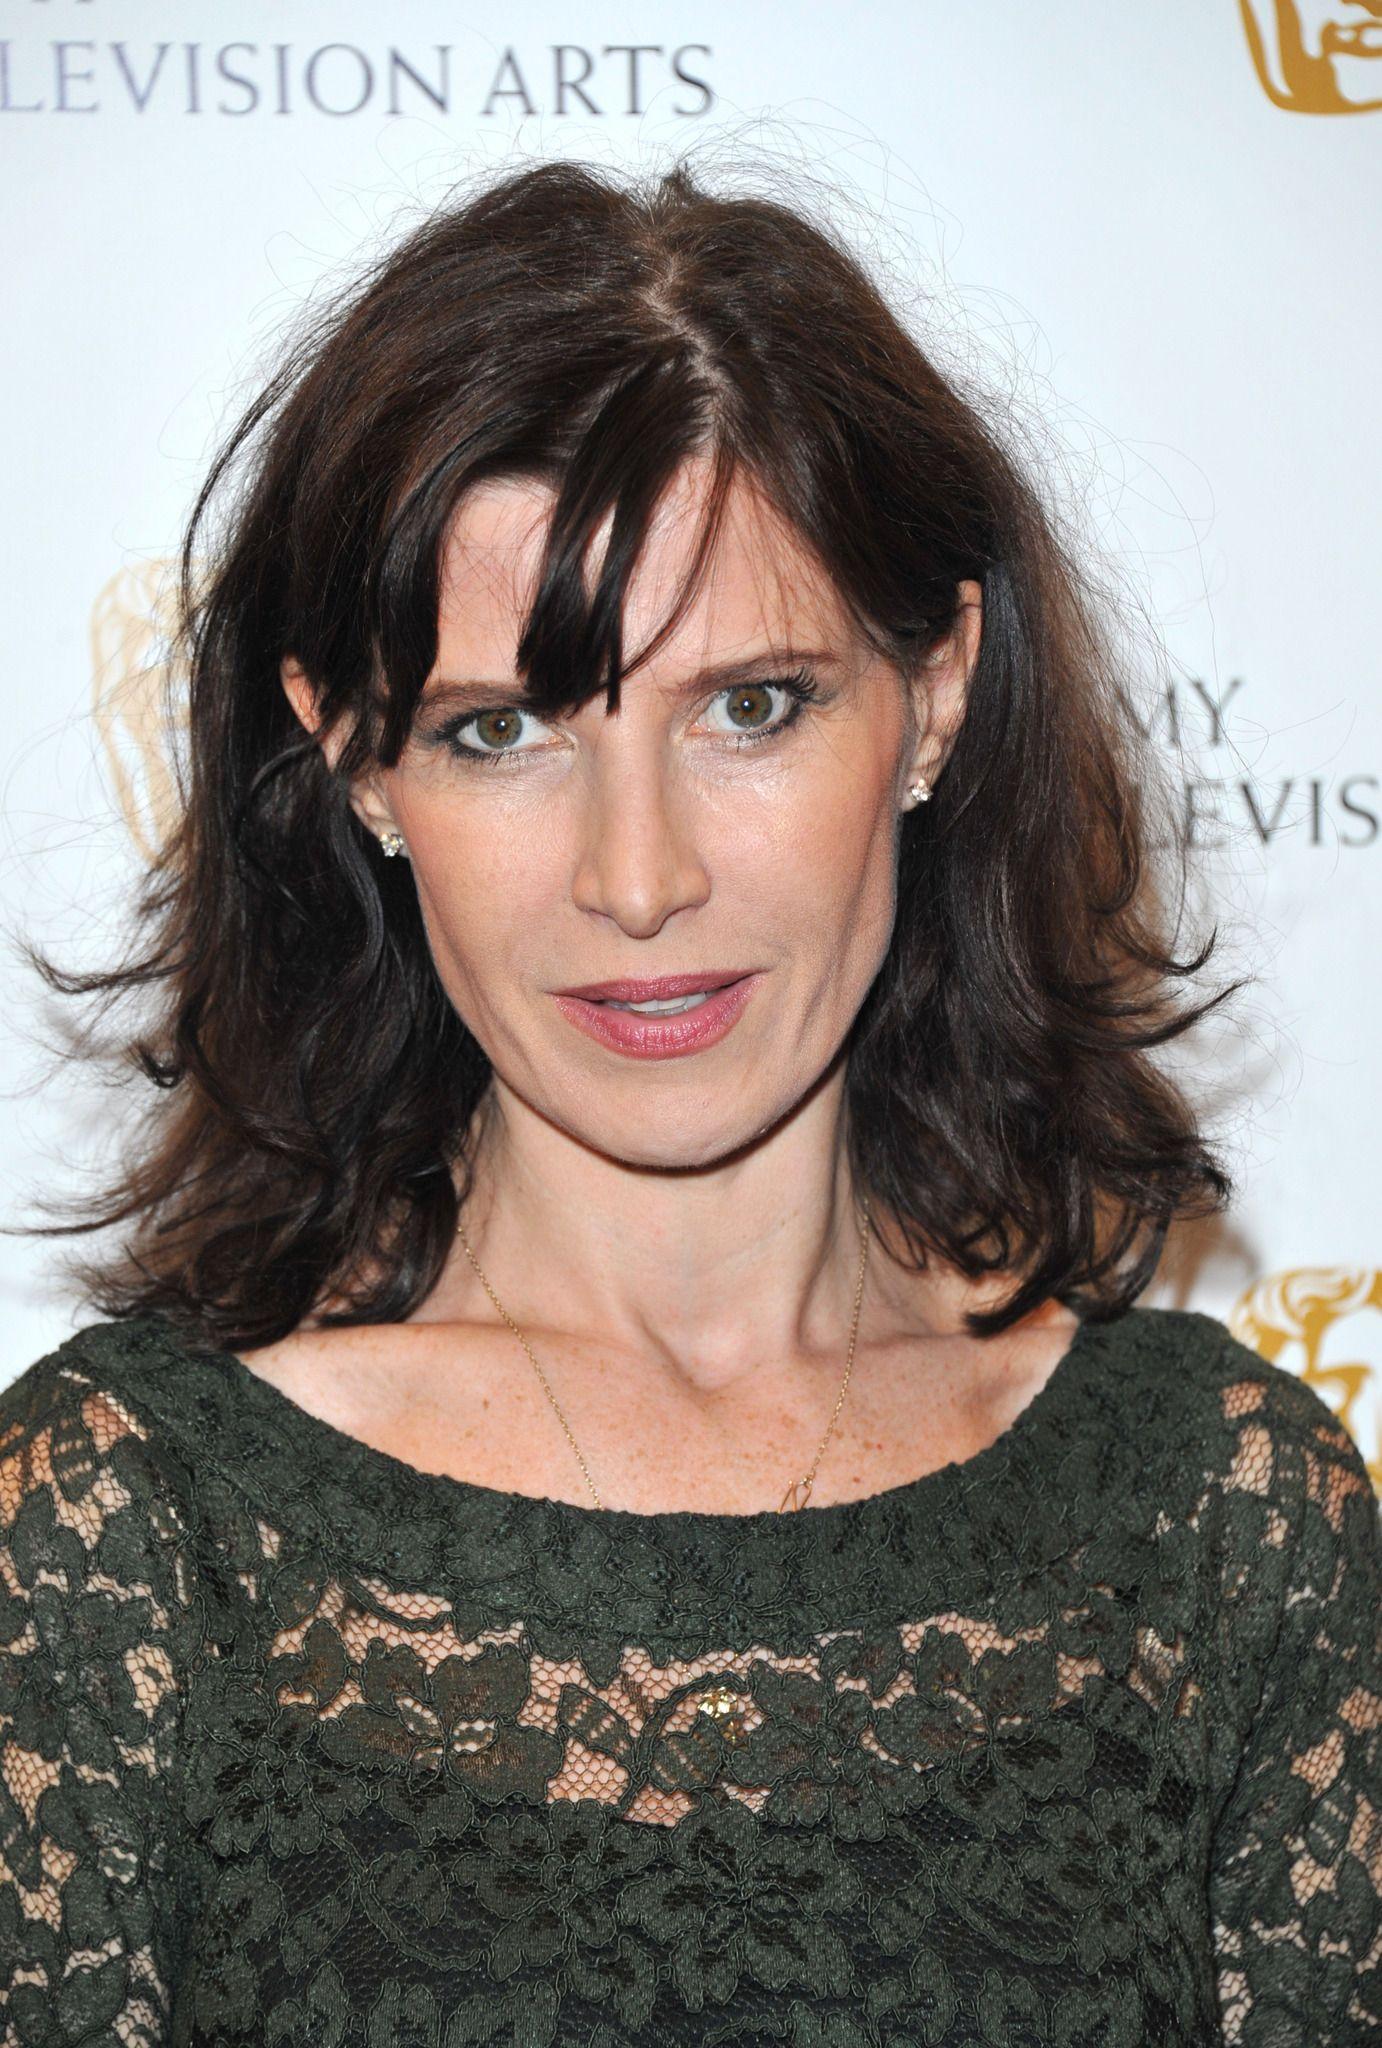 Ronni Ancona, Scottish actress comedian, 46 yrs old